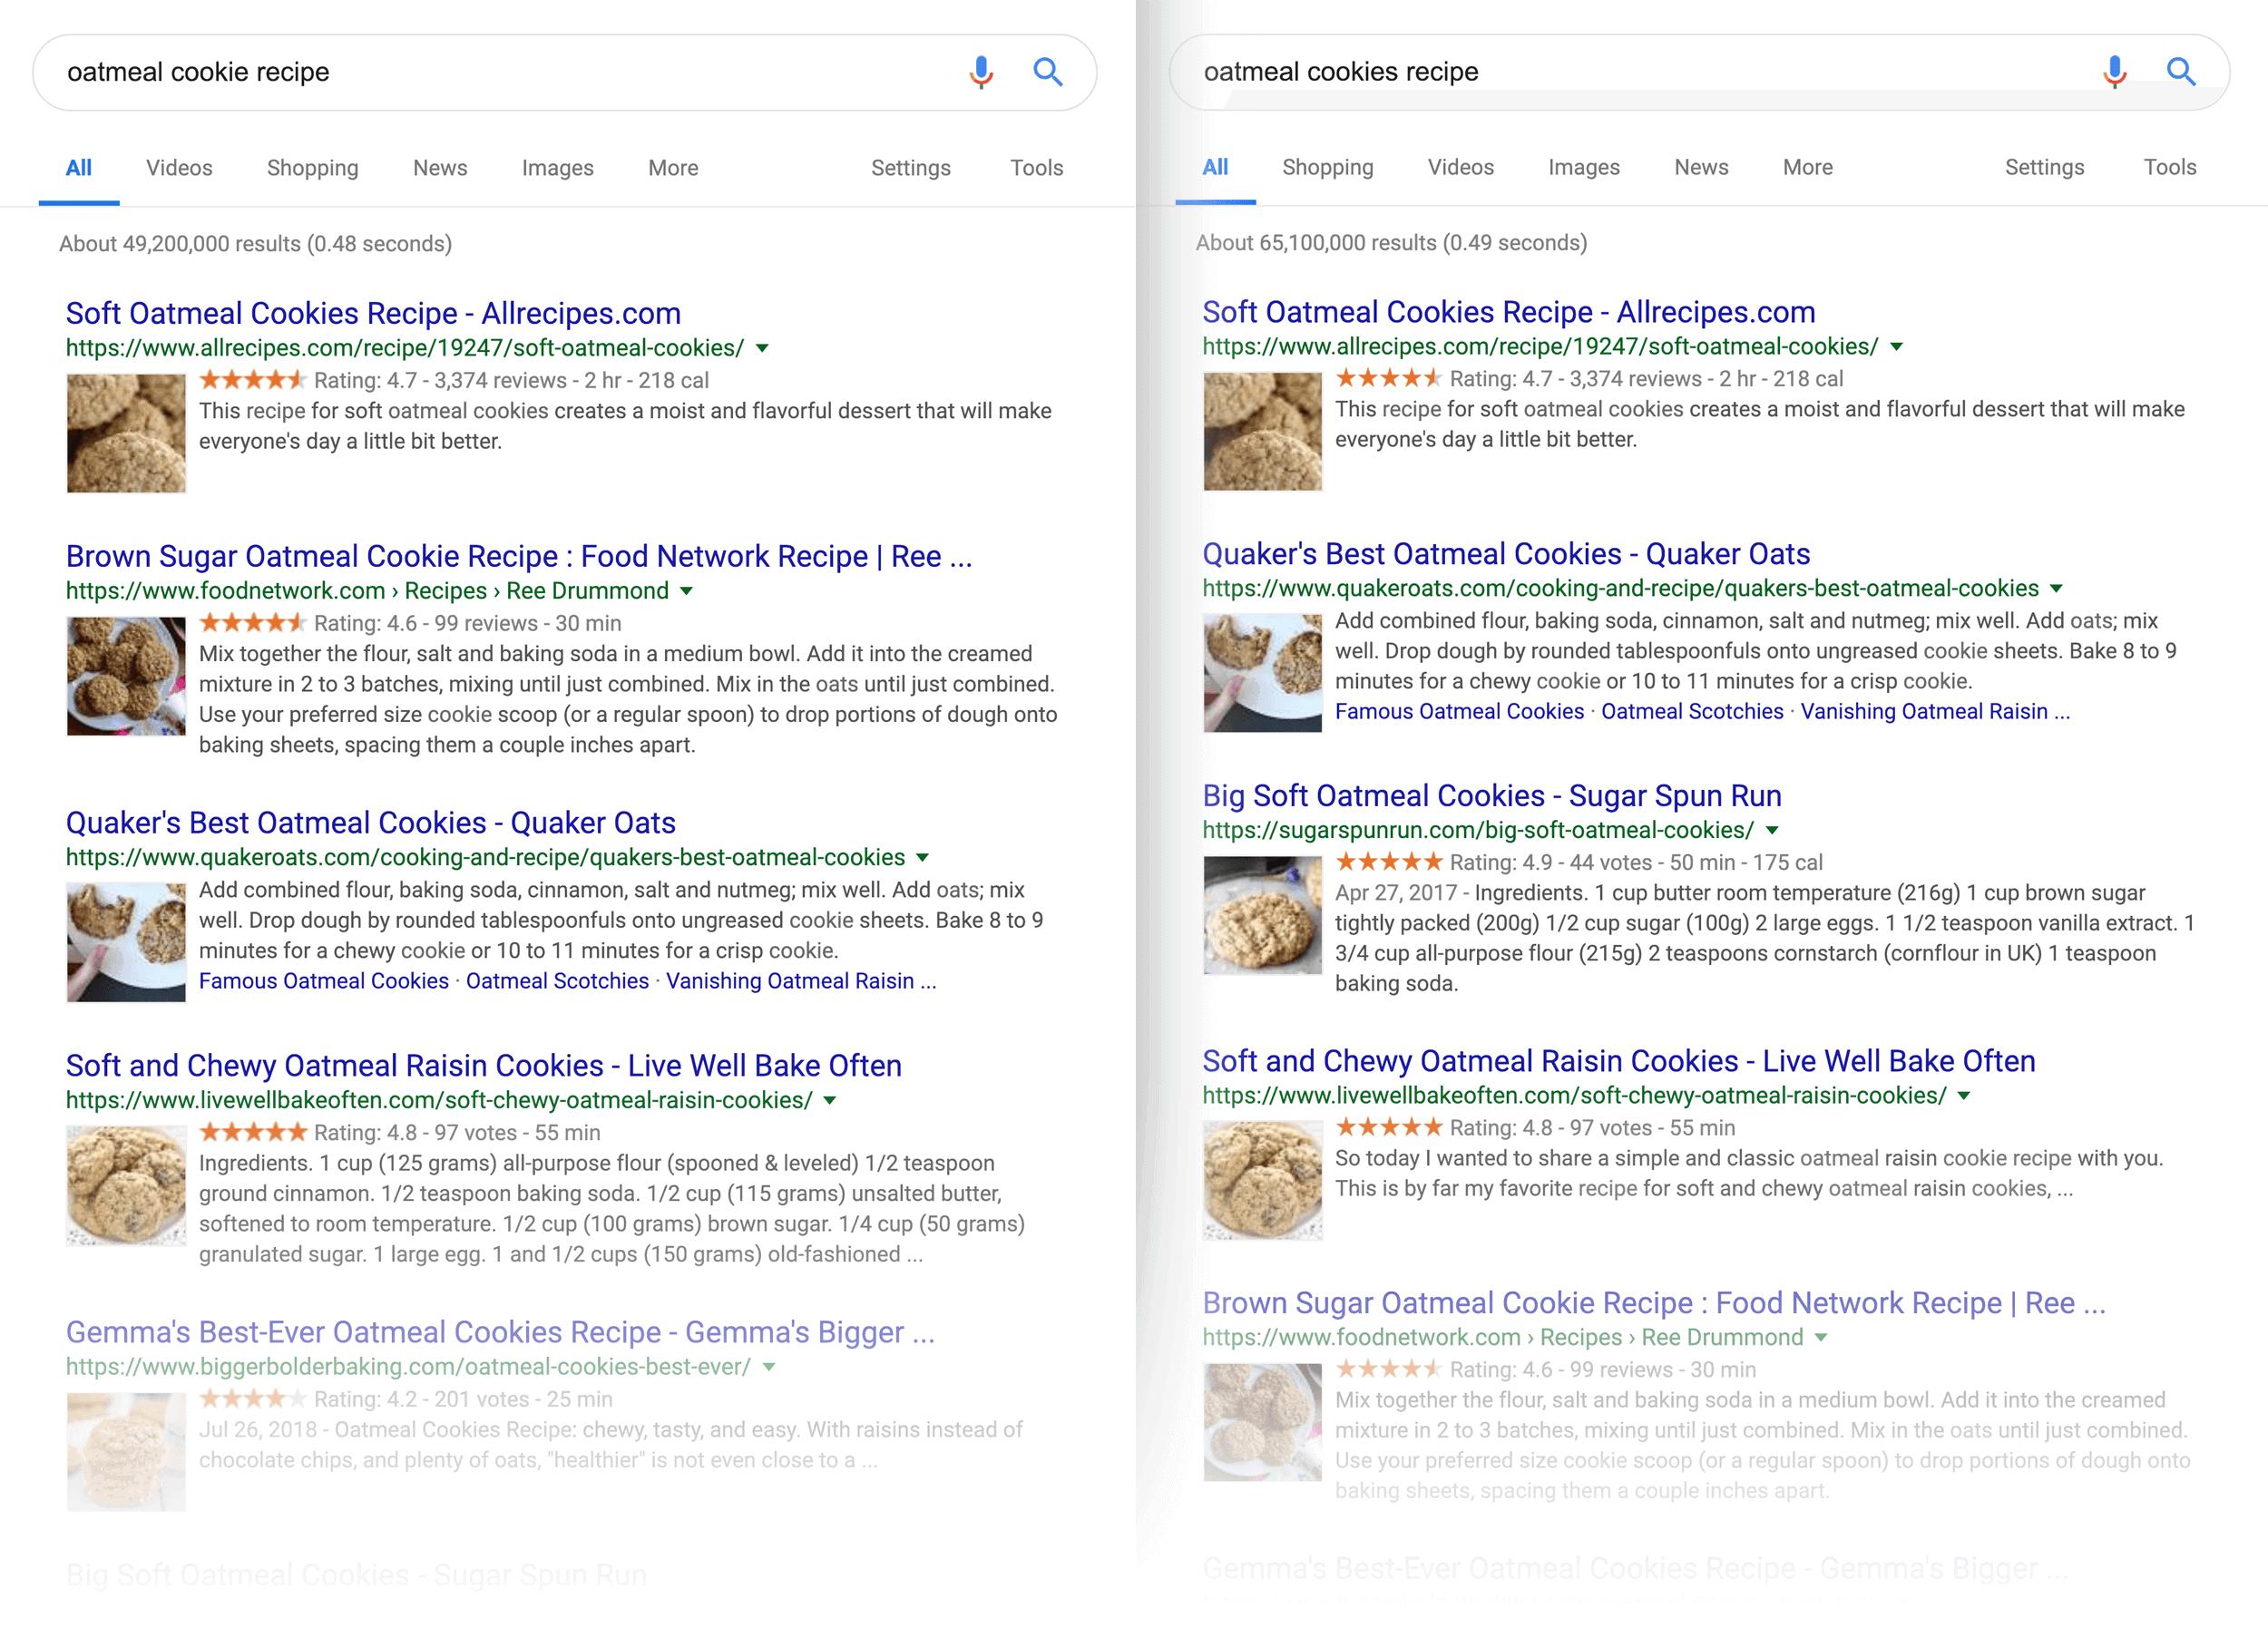 Similar search SERPs comparison